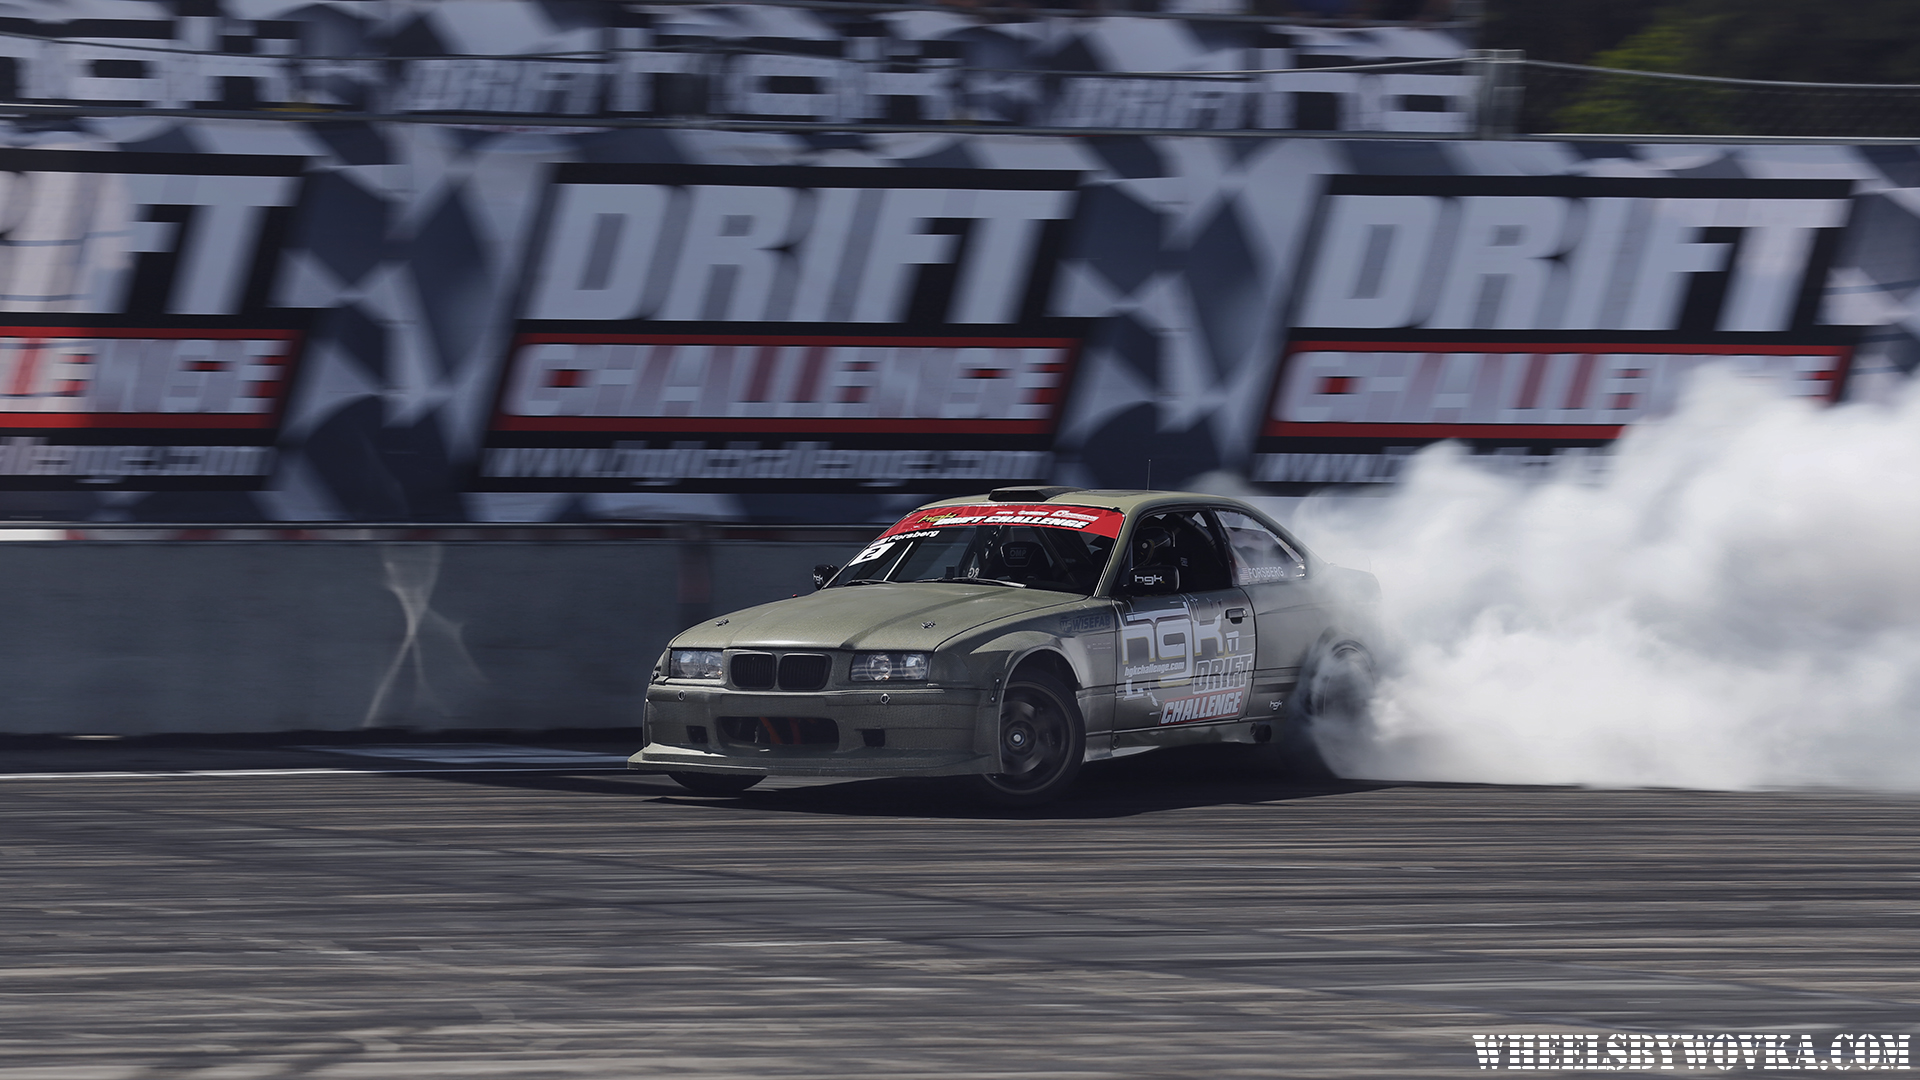 hgk-drift-challenge-2017-by-wheelsbywovka-8